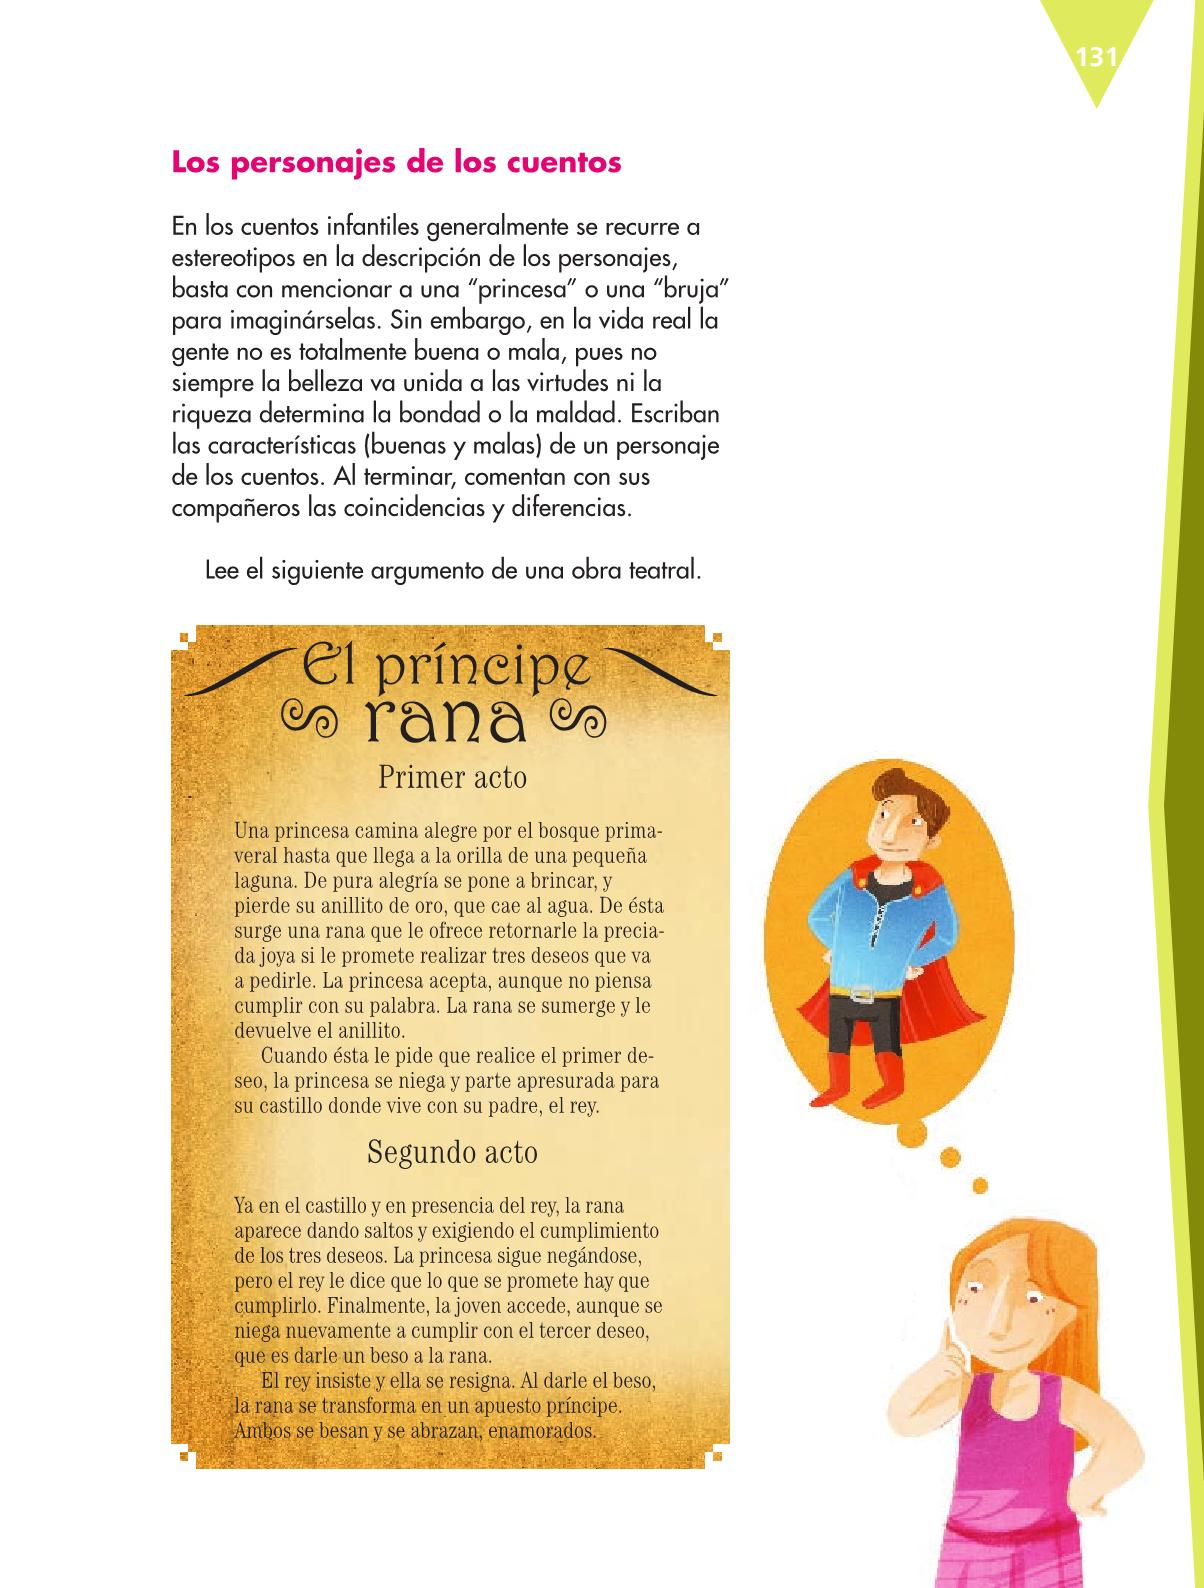 Español Libro para el alumnoquintoPagina 131